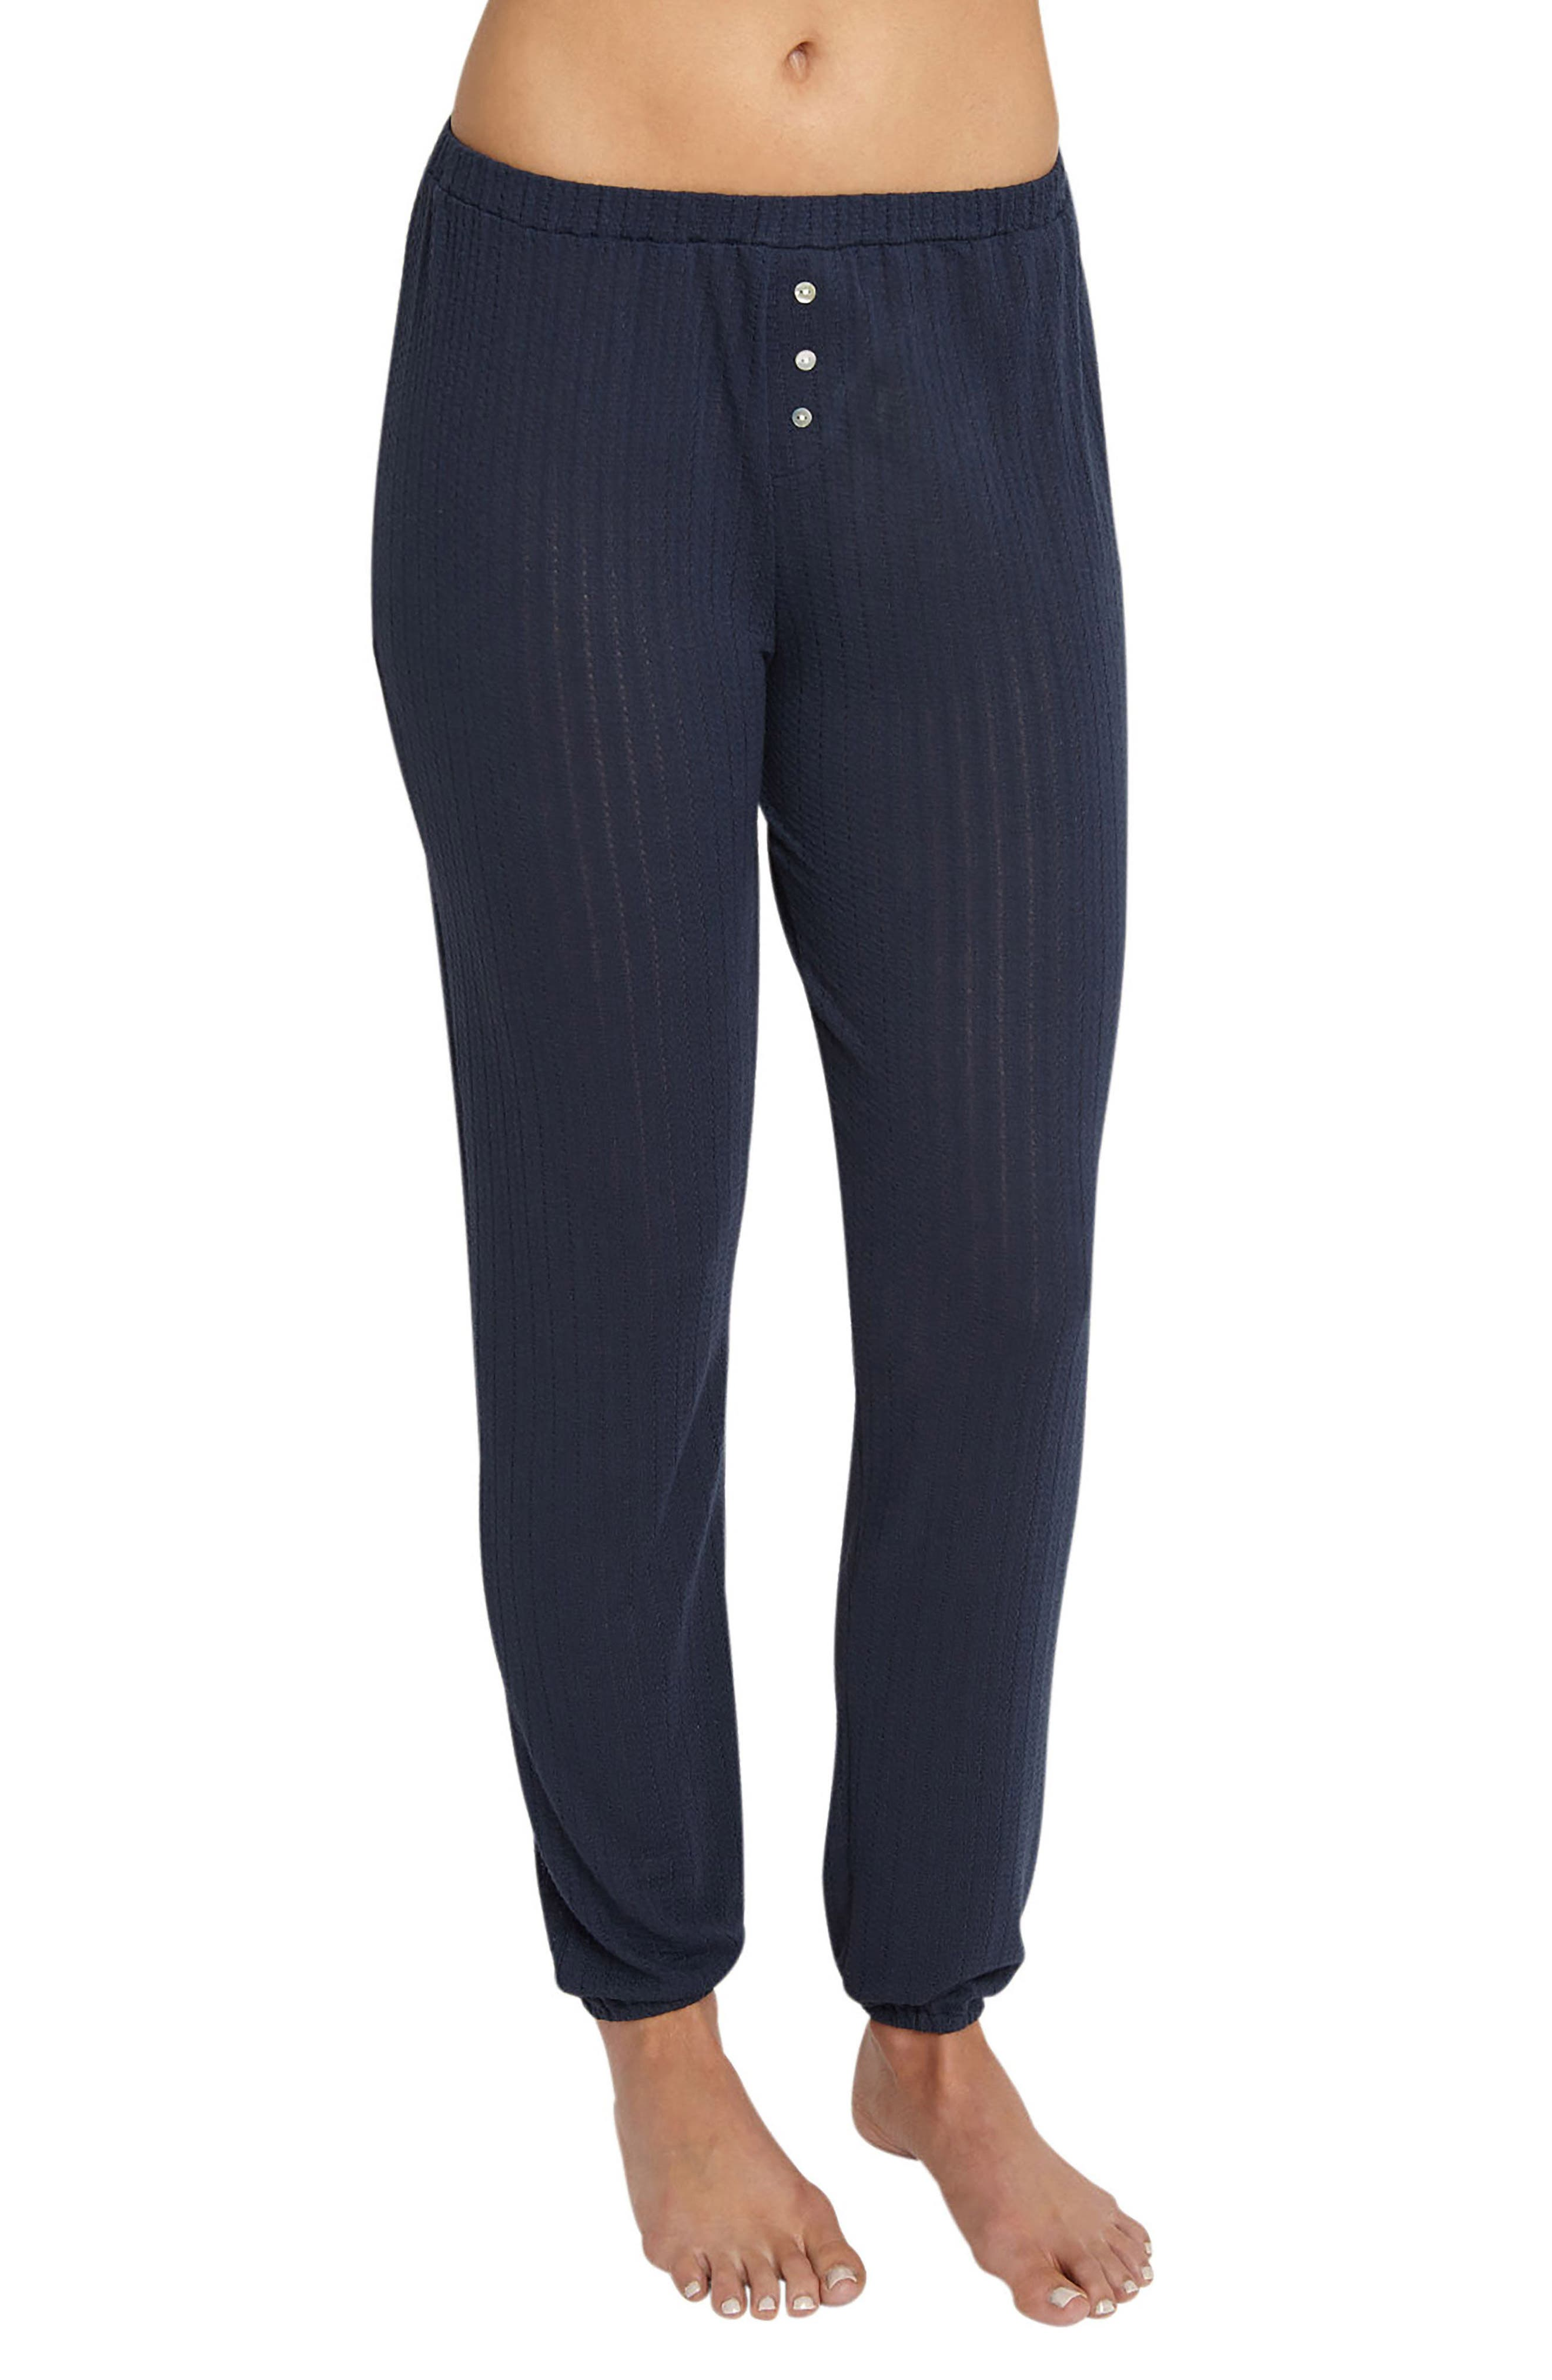 Blue Nights Baxter Pants,                         Main,                         color, Blue Nights